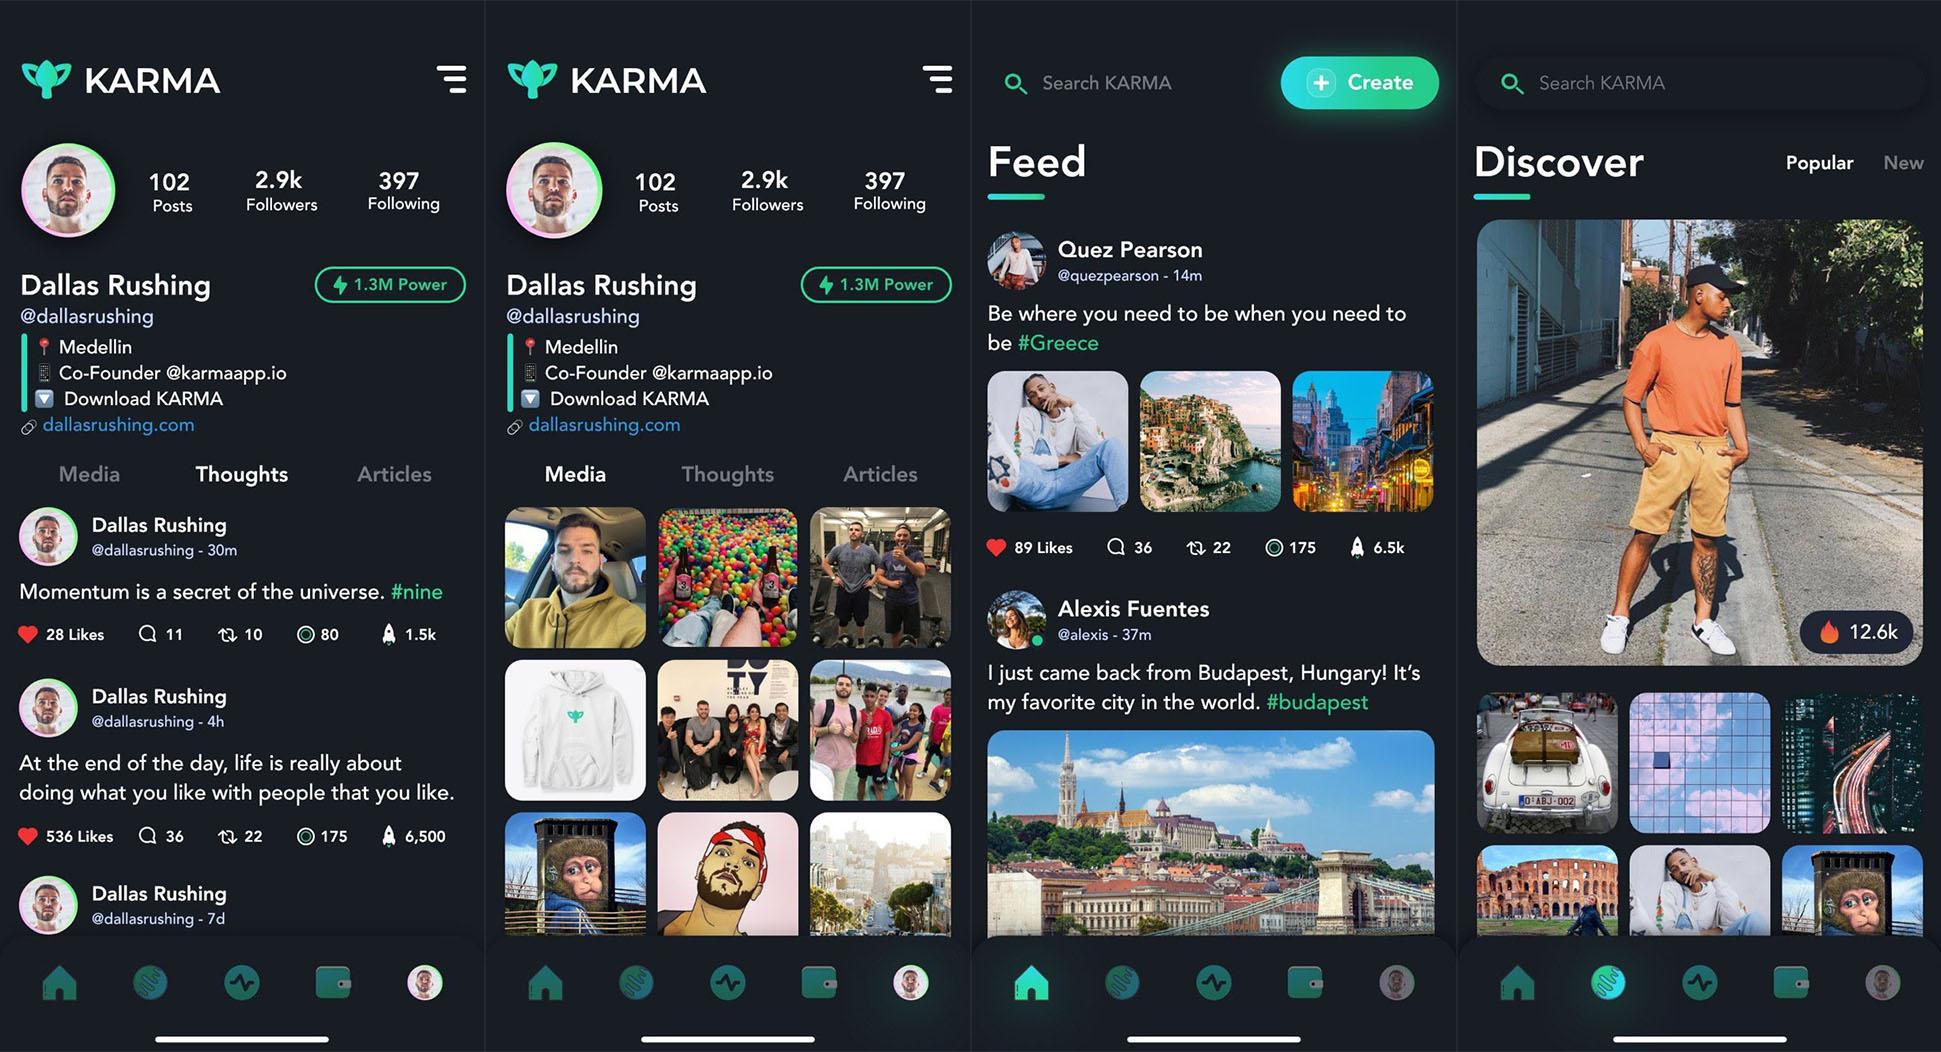 karma-image-1